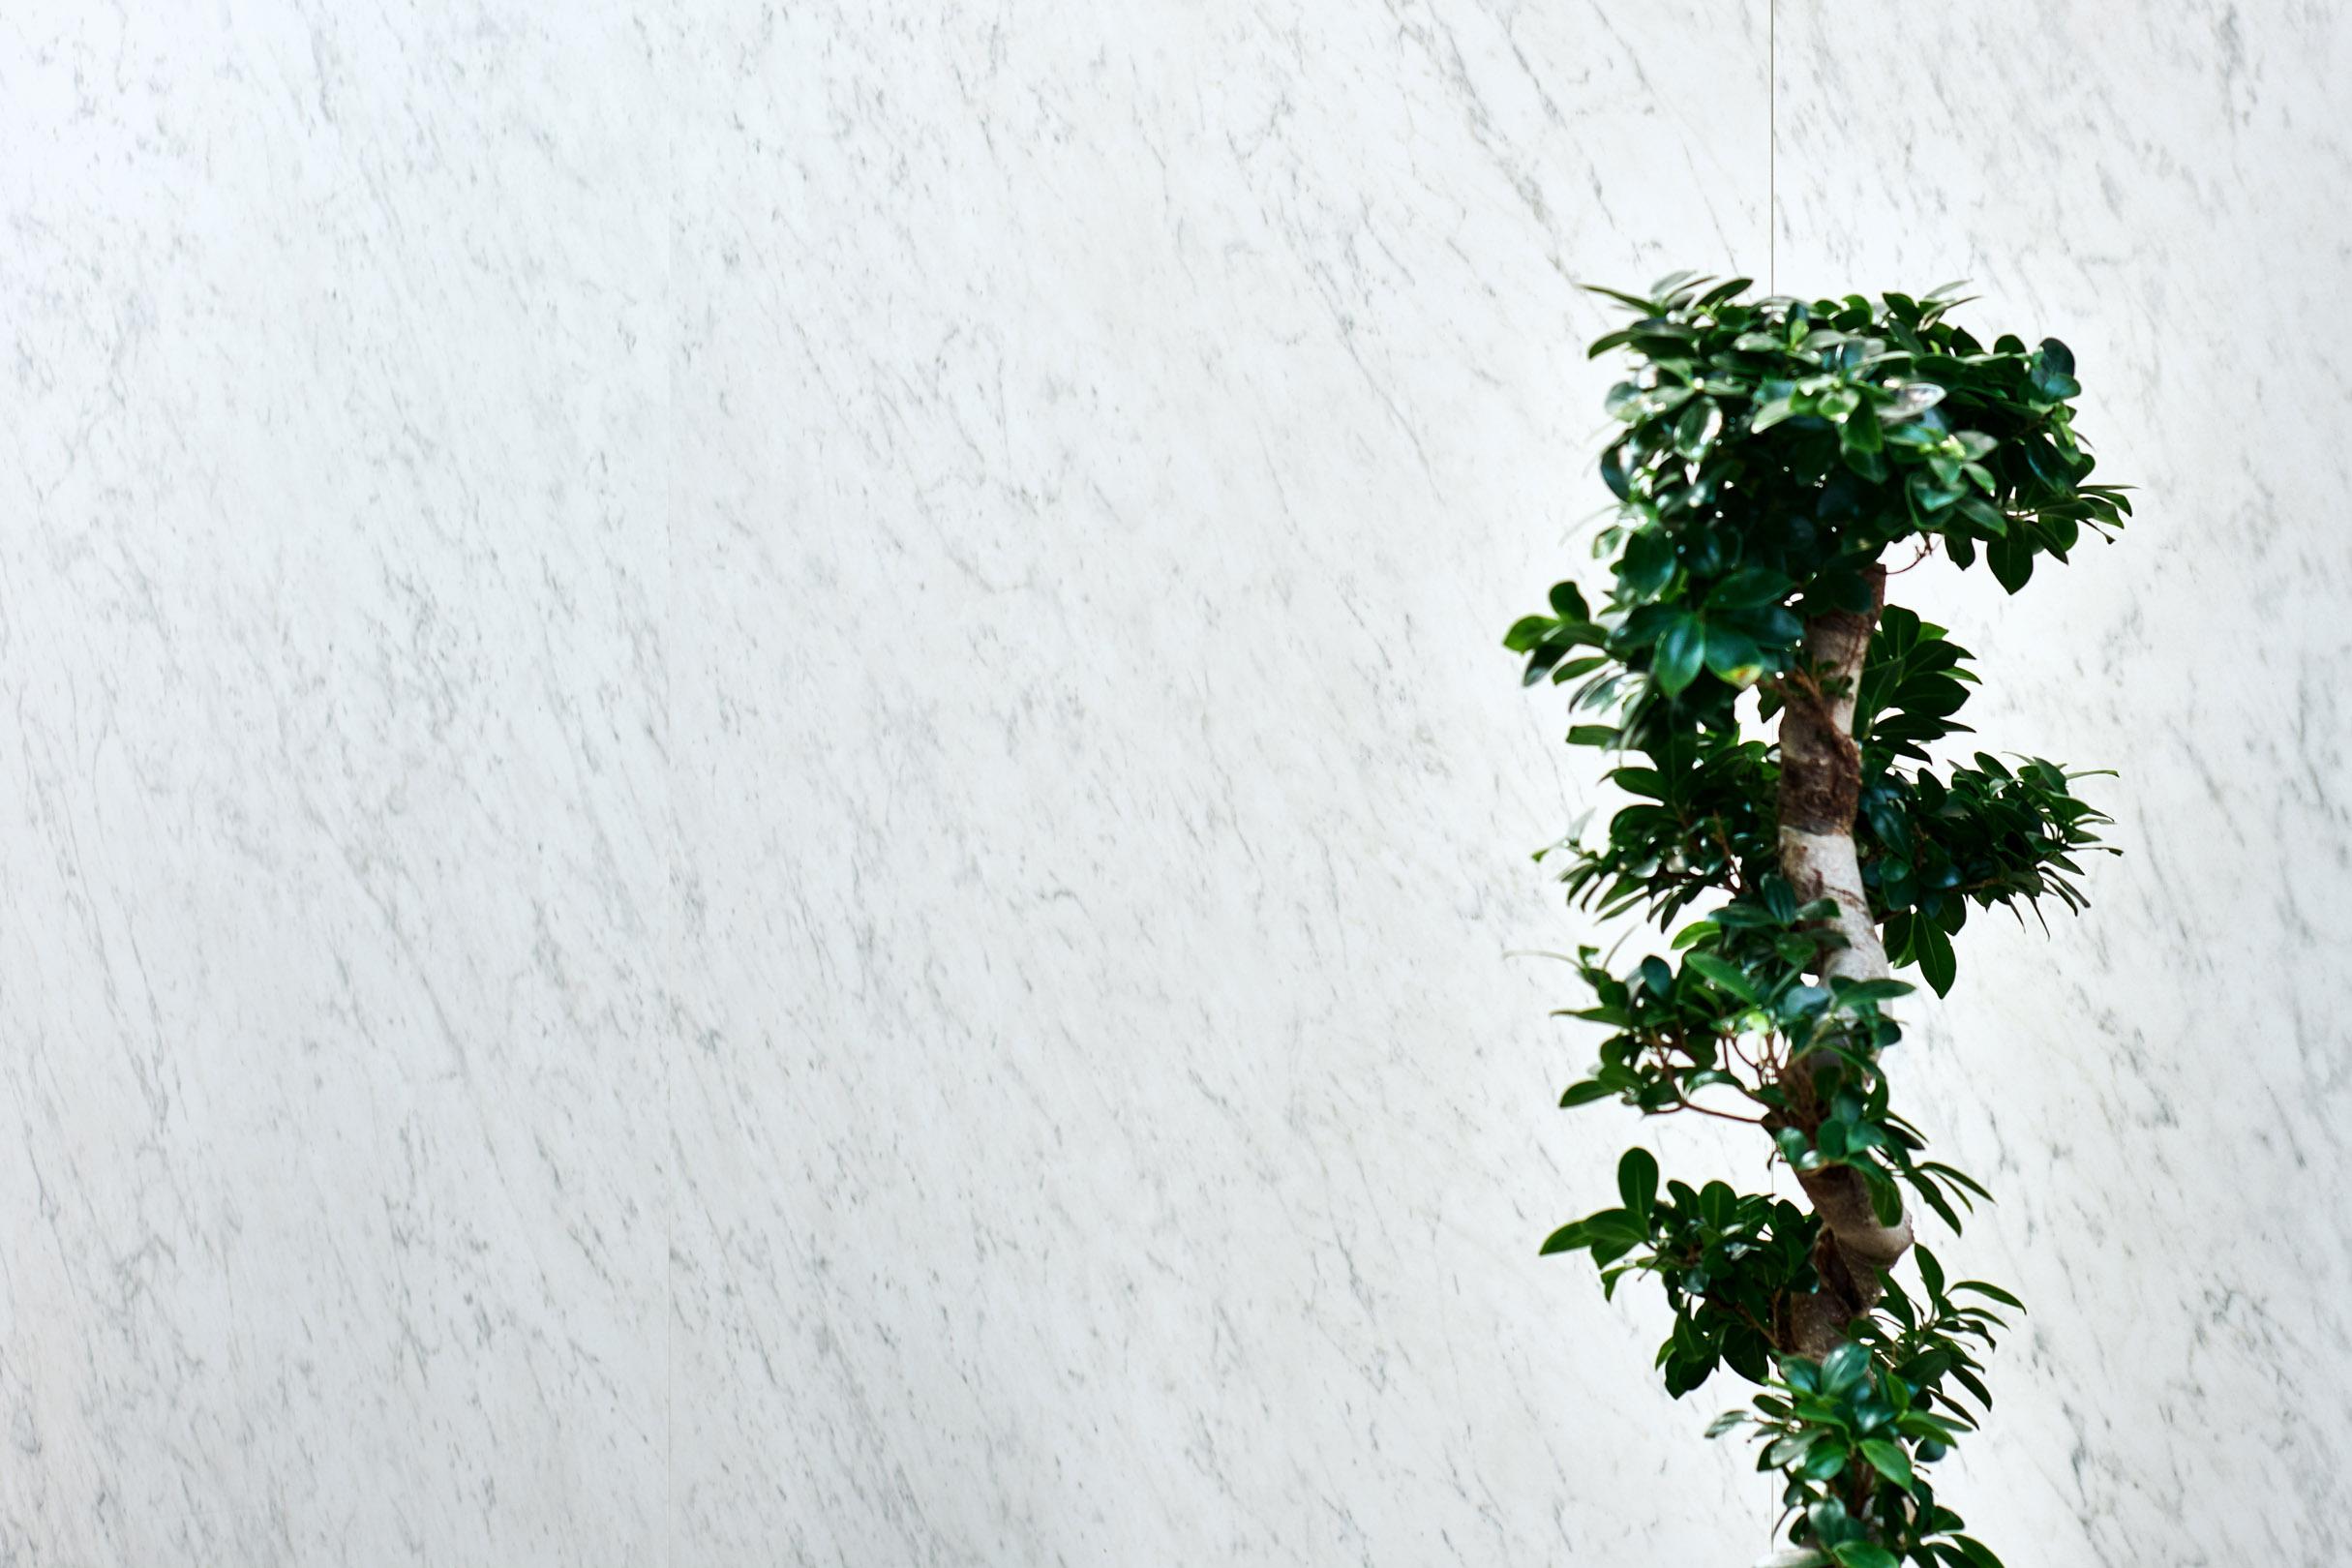 porcelain tile images: Grandi Marmi range high quality photo